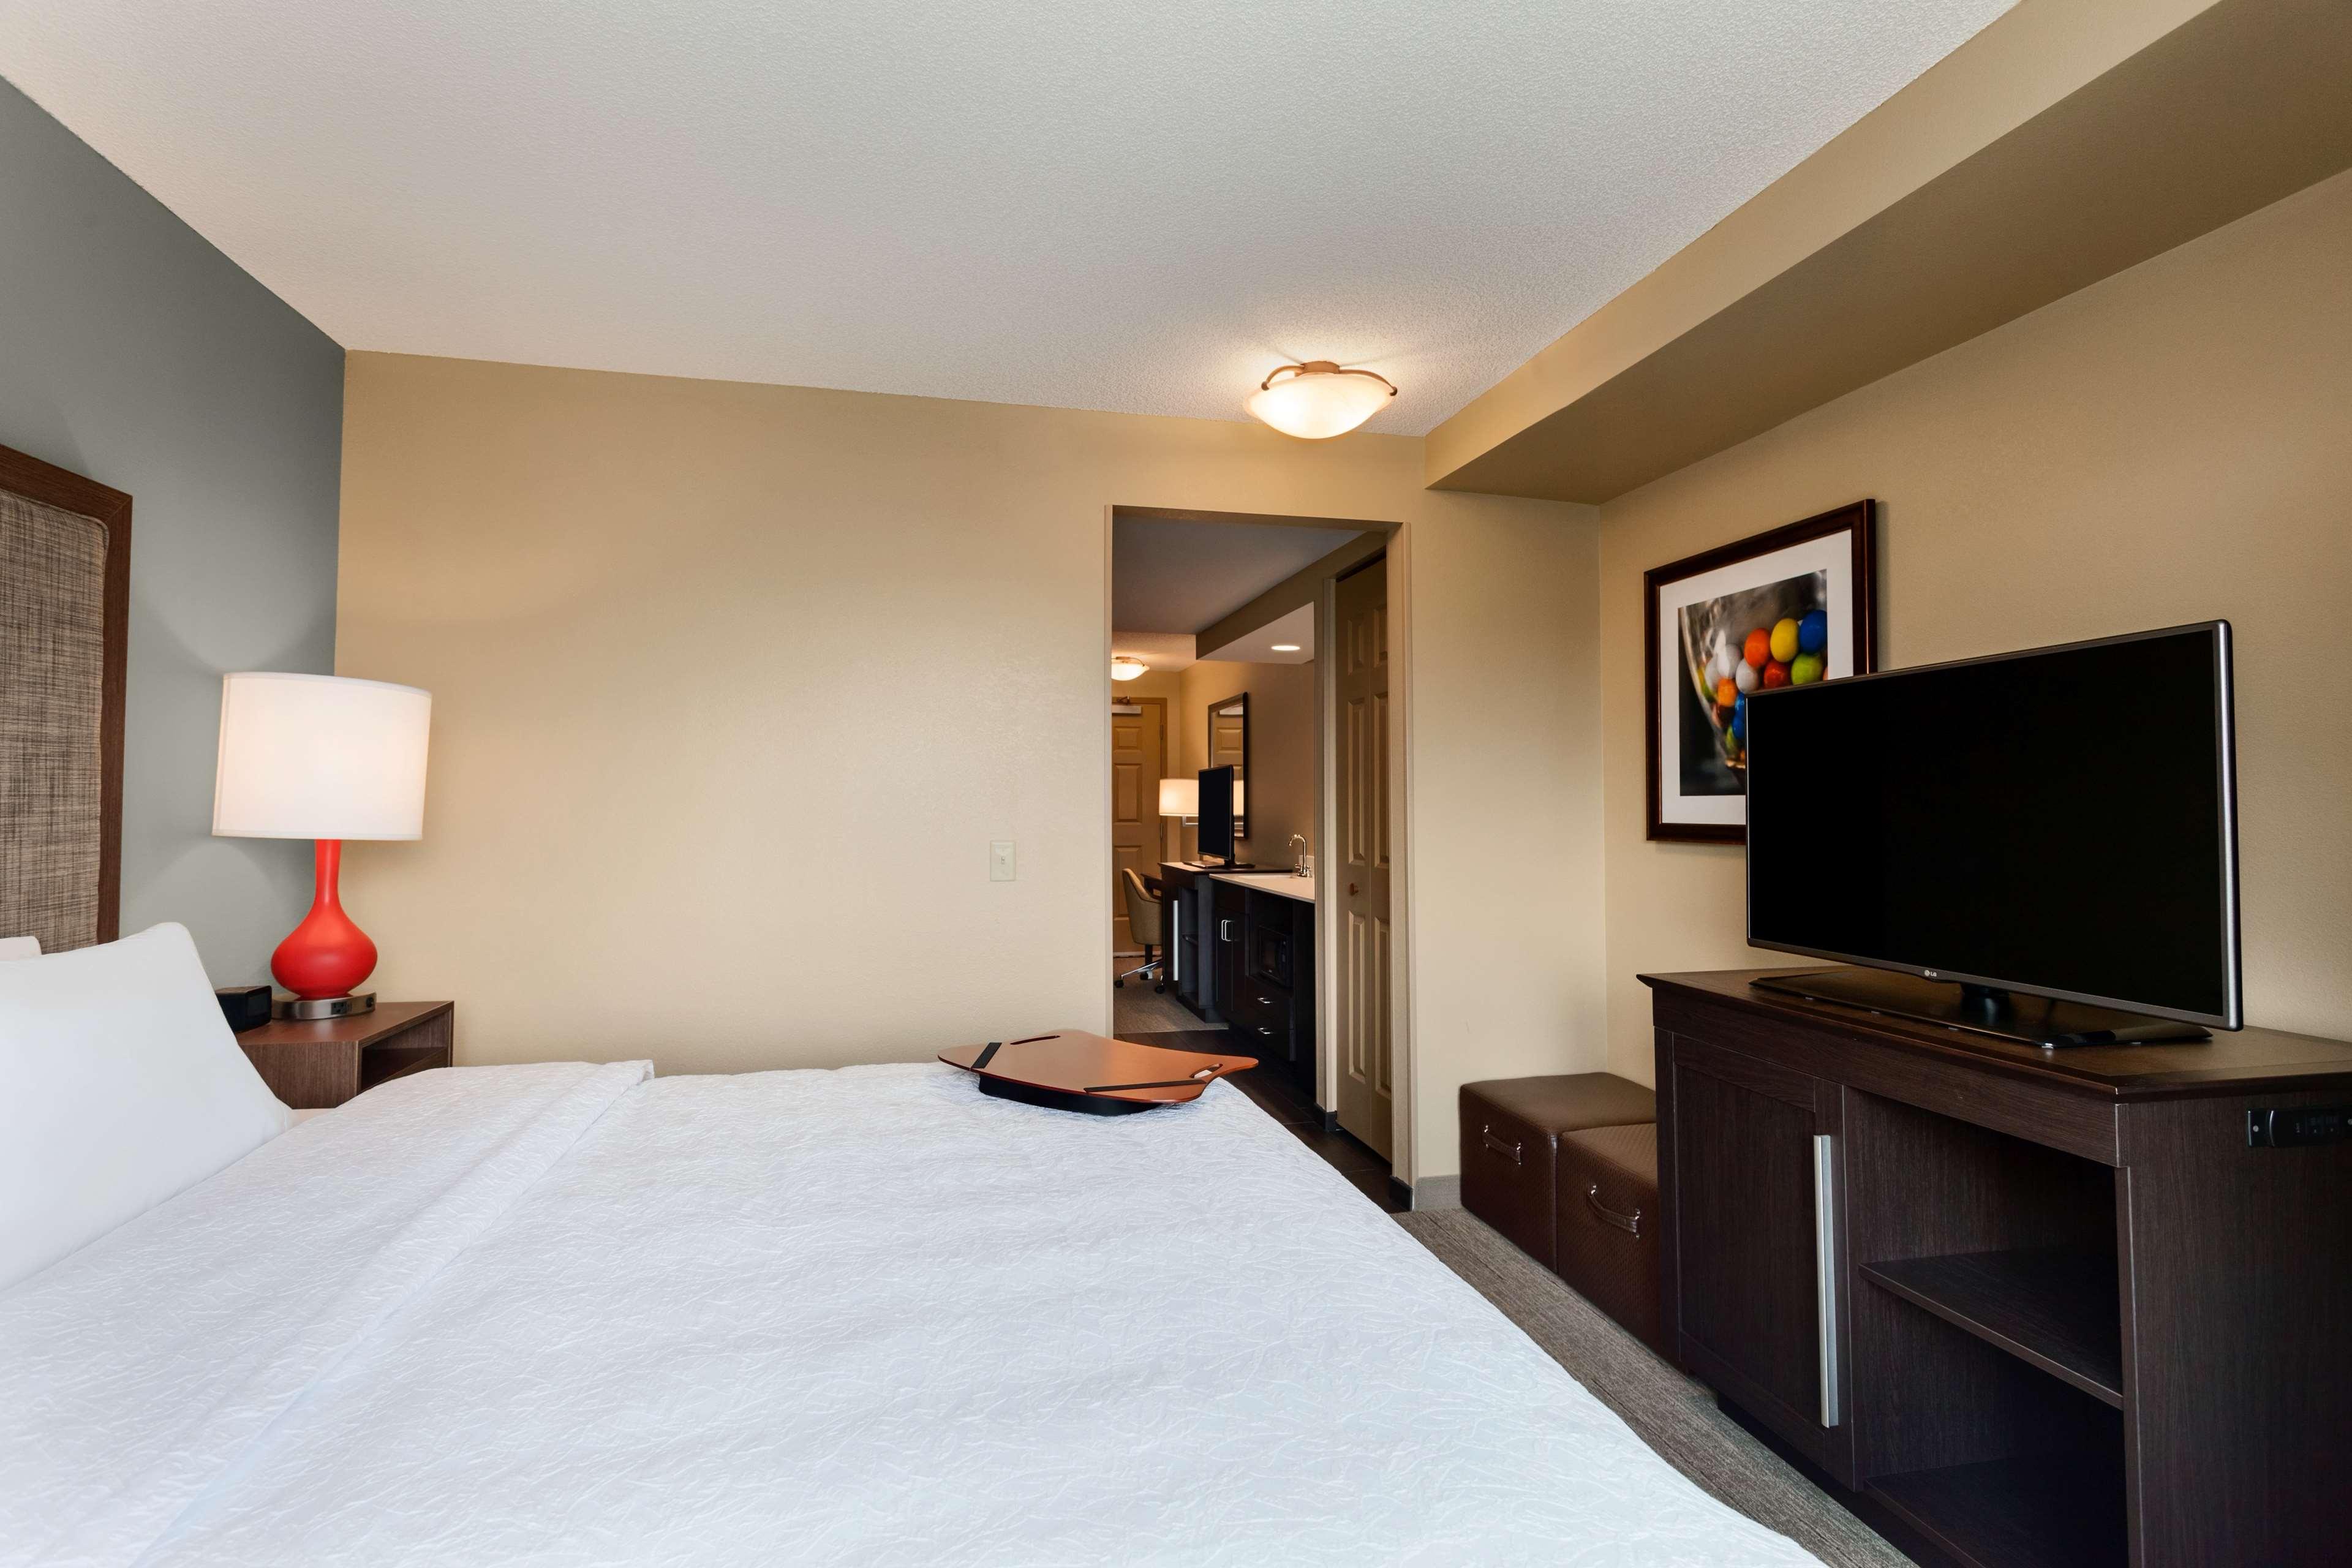 Hampton Inn & Suites Hershey Near The Park image 15